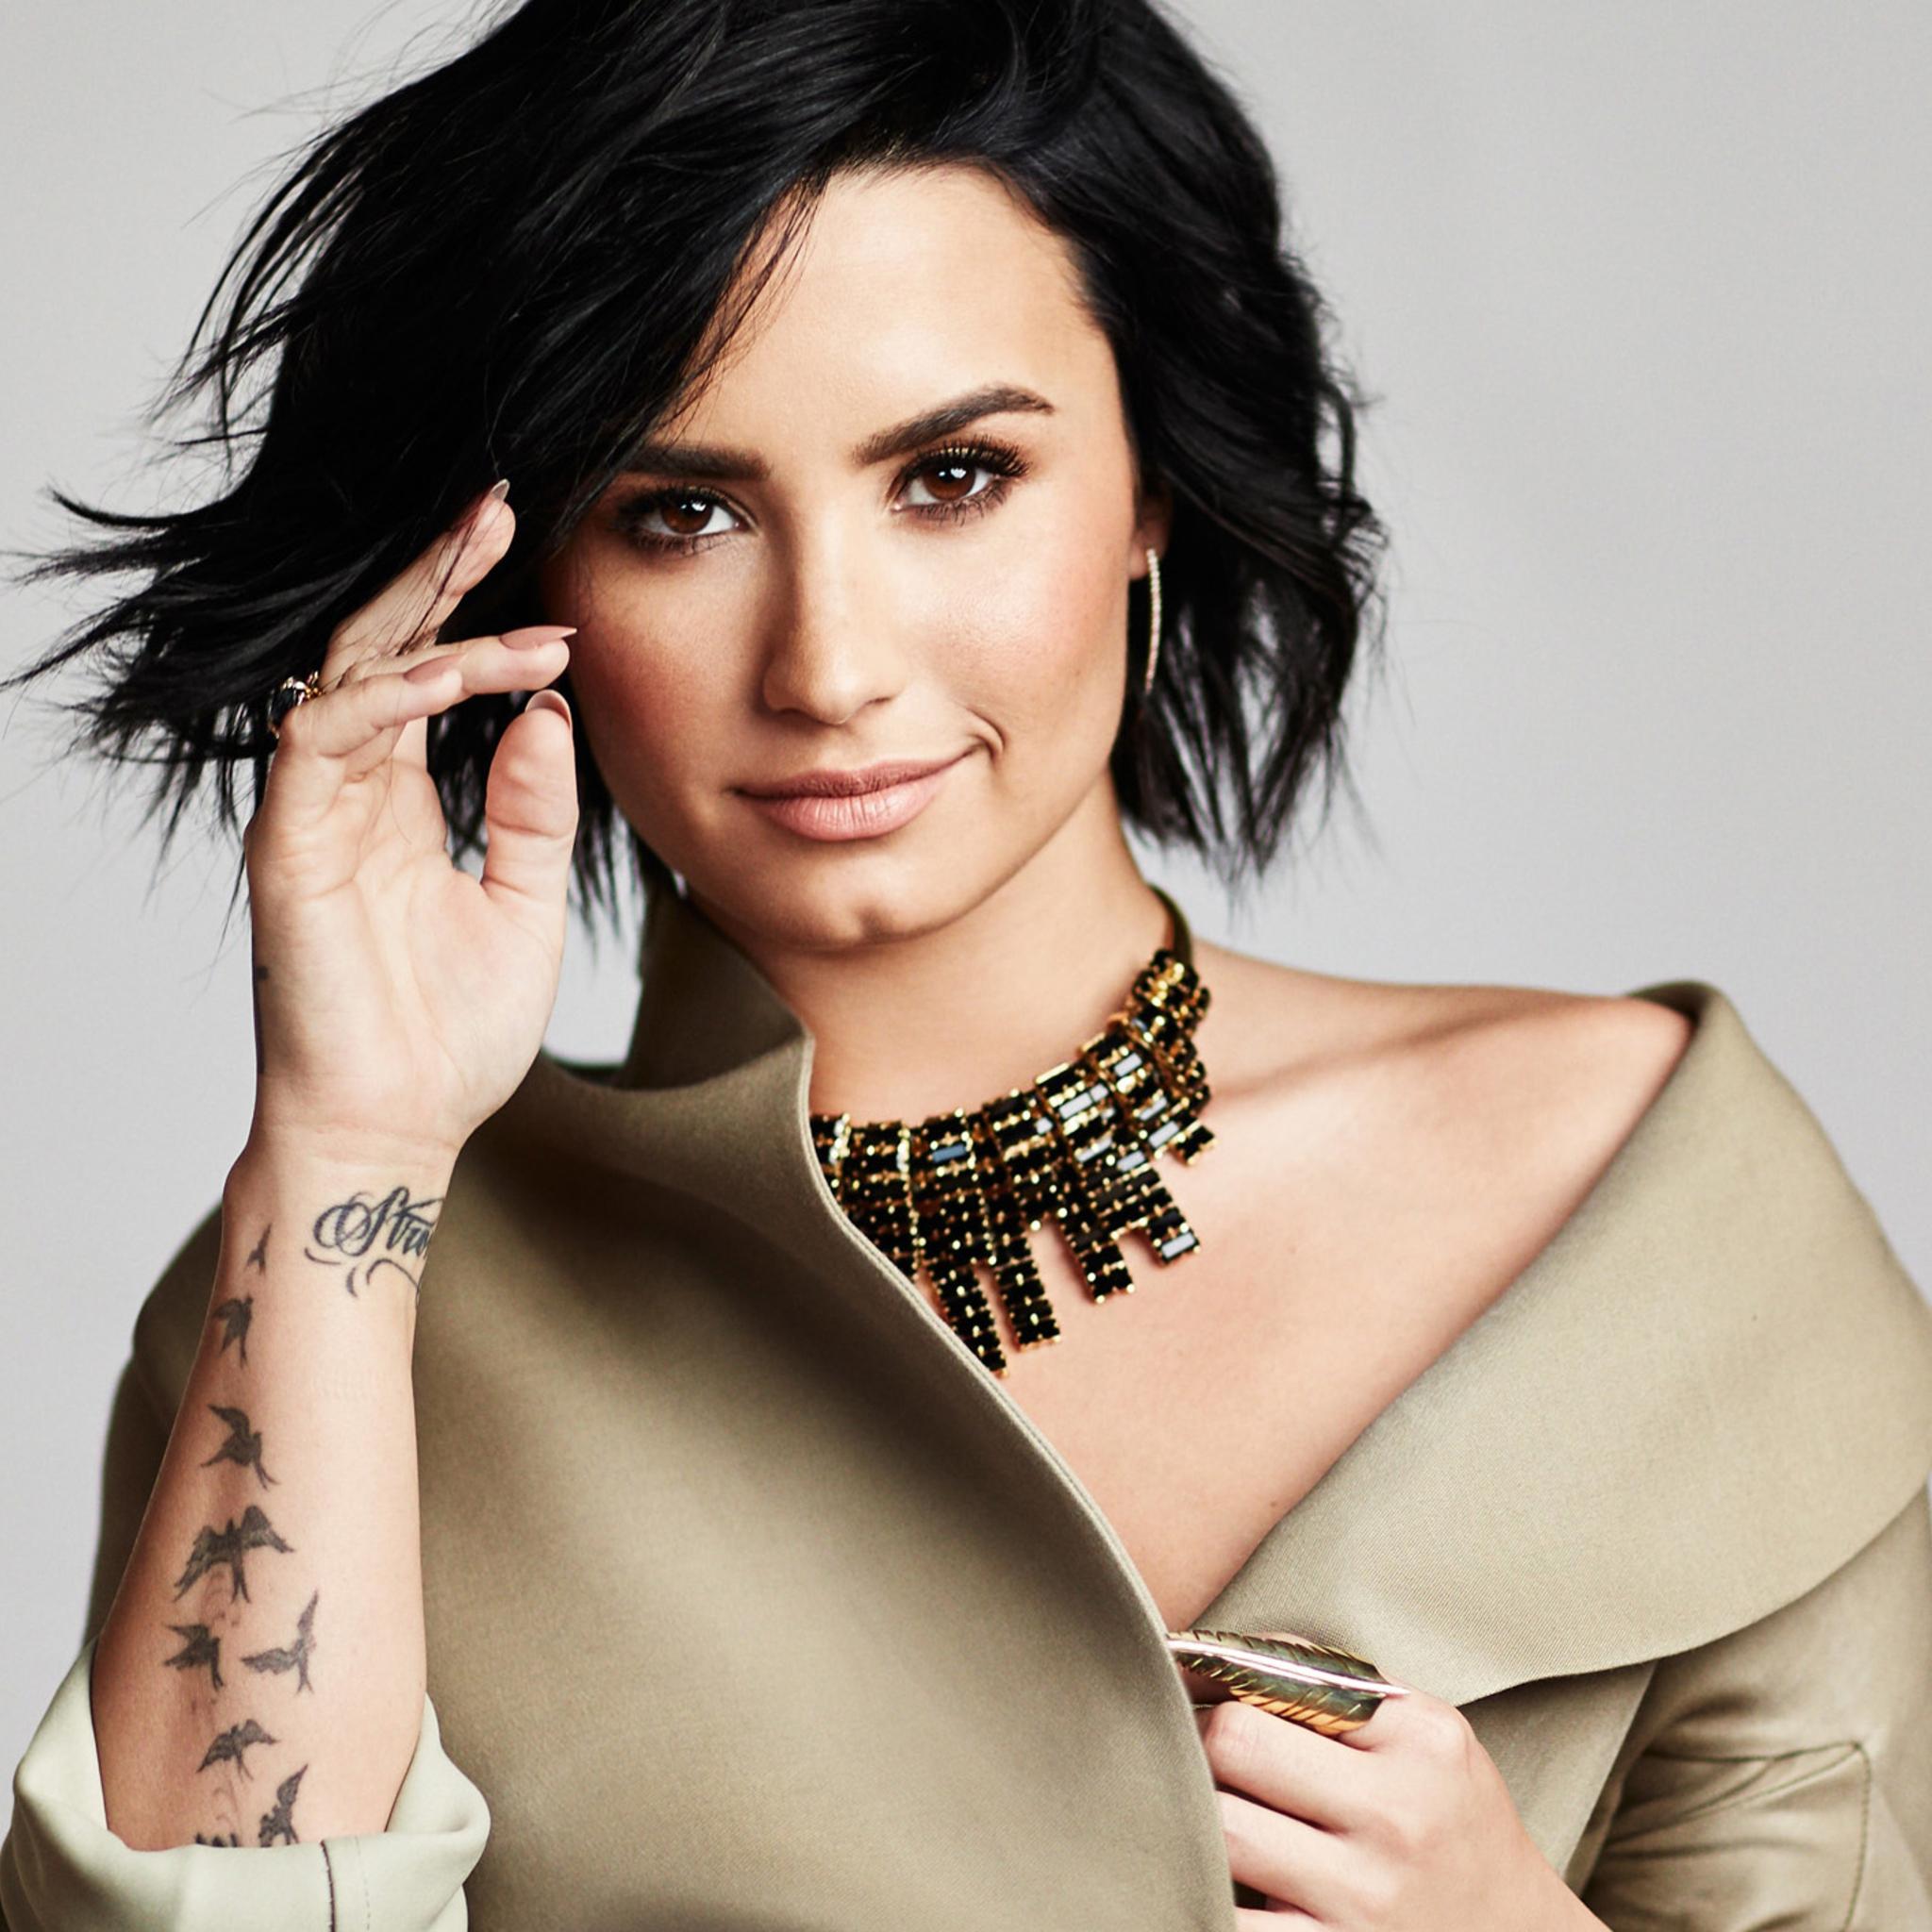 Demi Lovato Wallpaper: 2048x2048 2016 Demi Lovato Ipad Air HD 4k Wallpapers